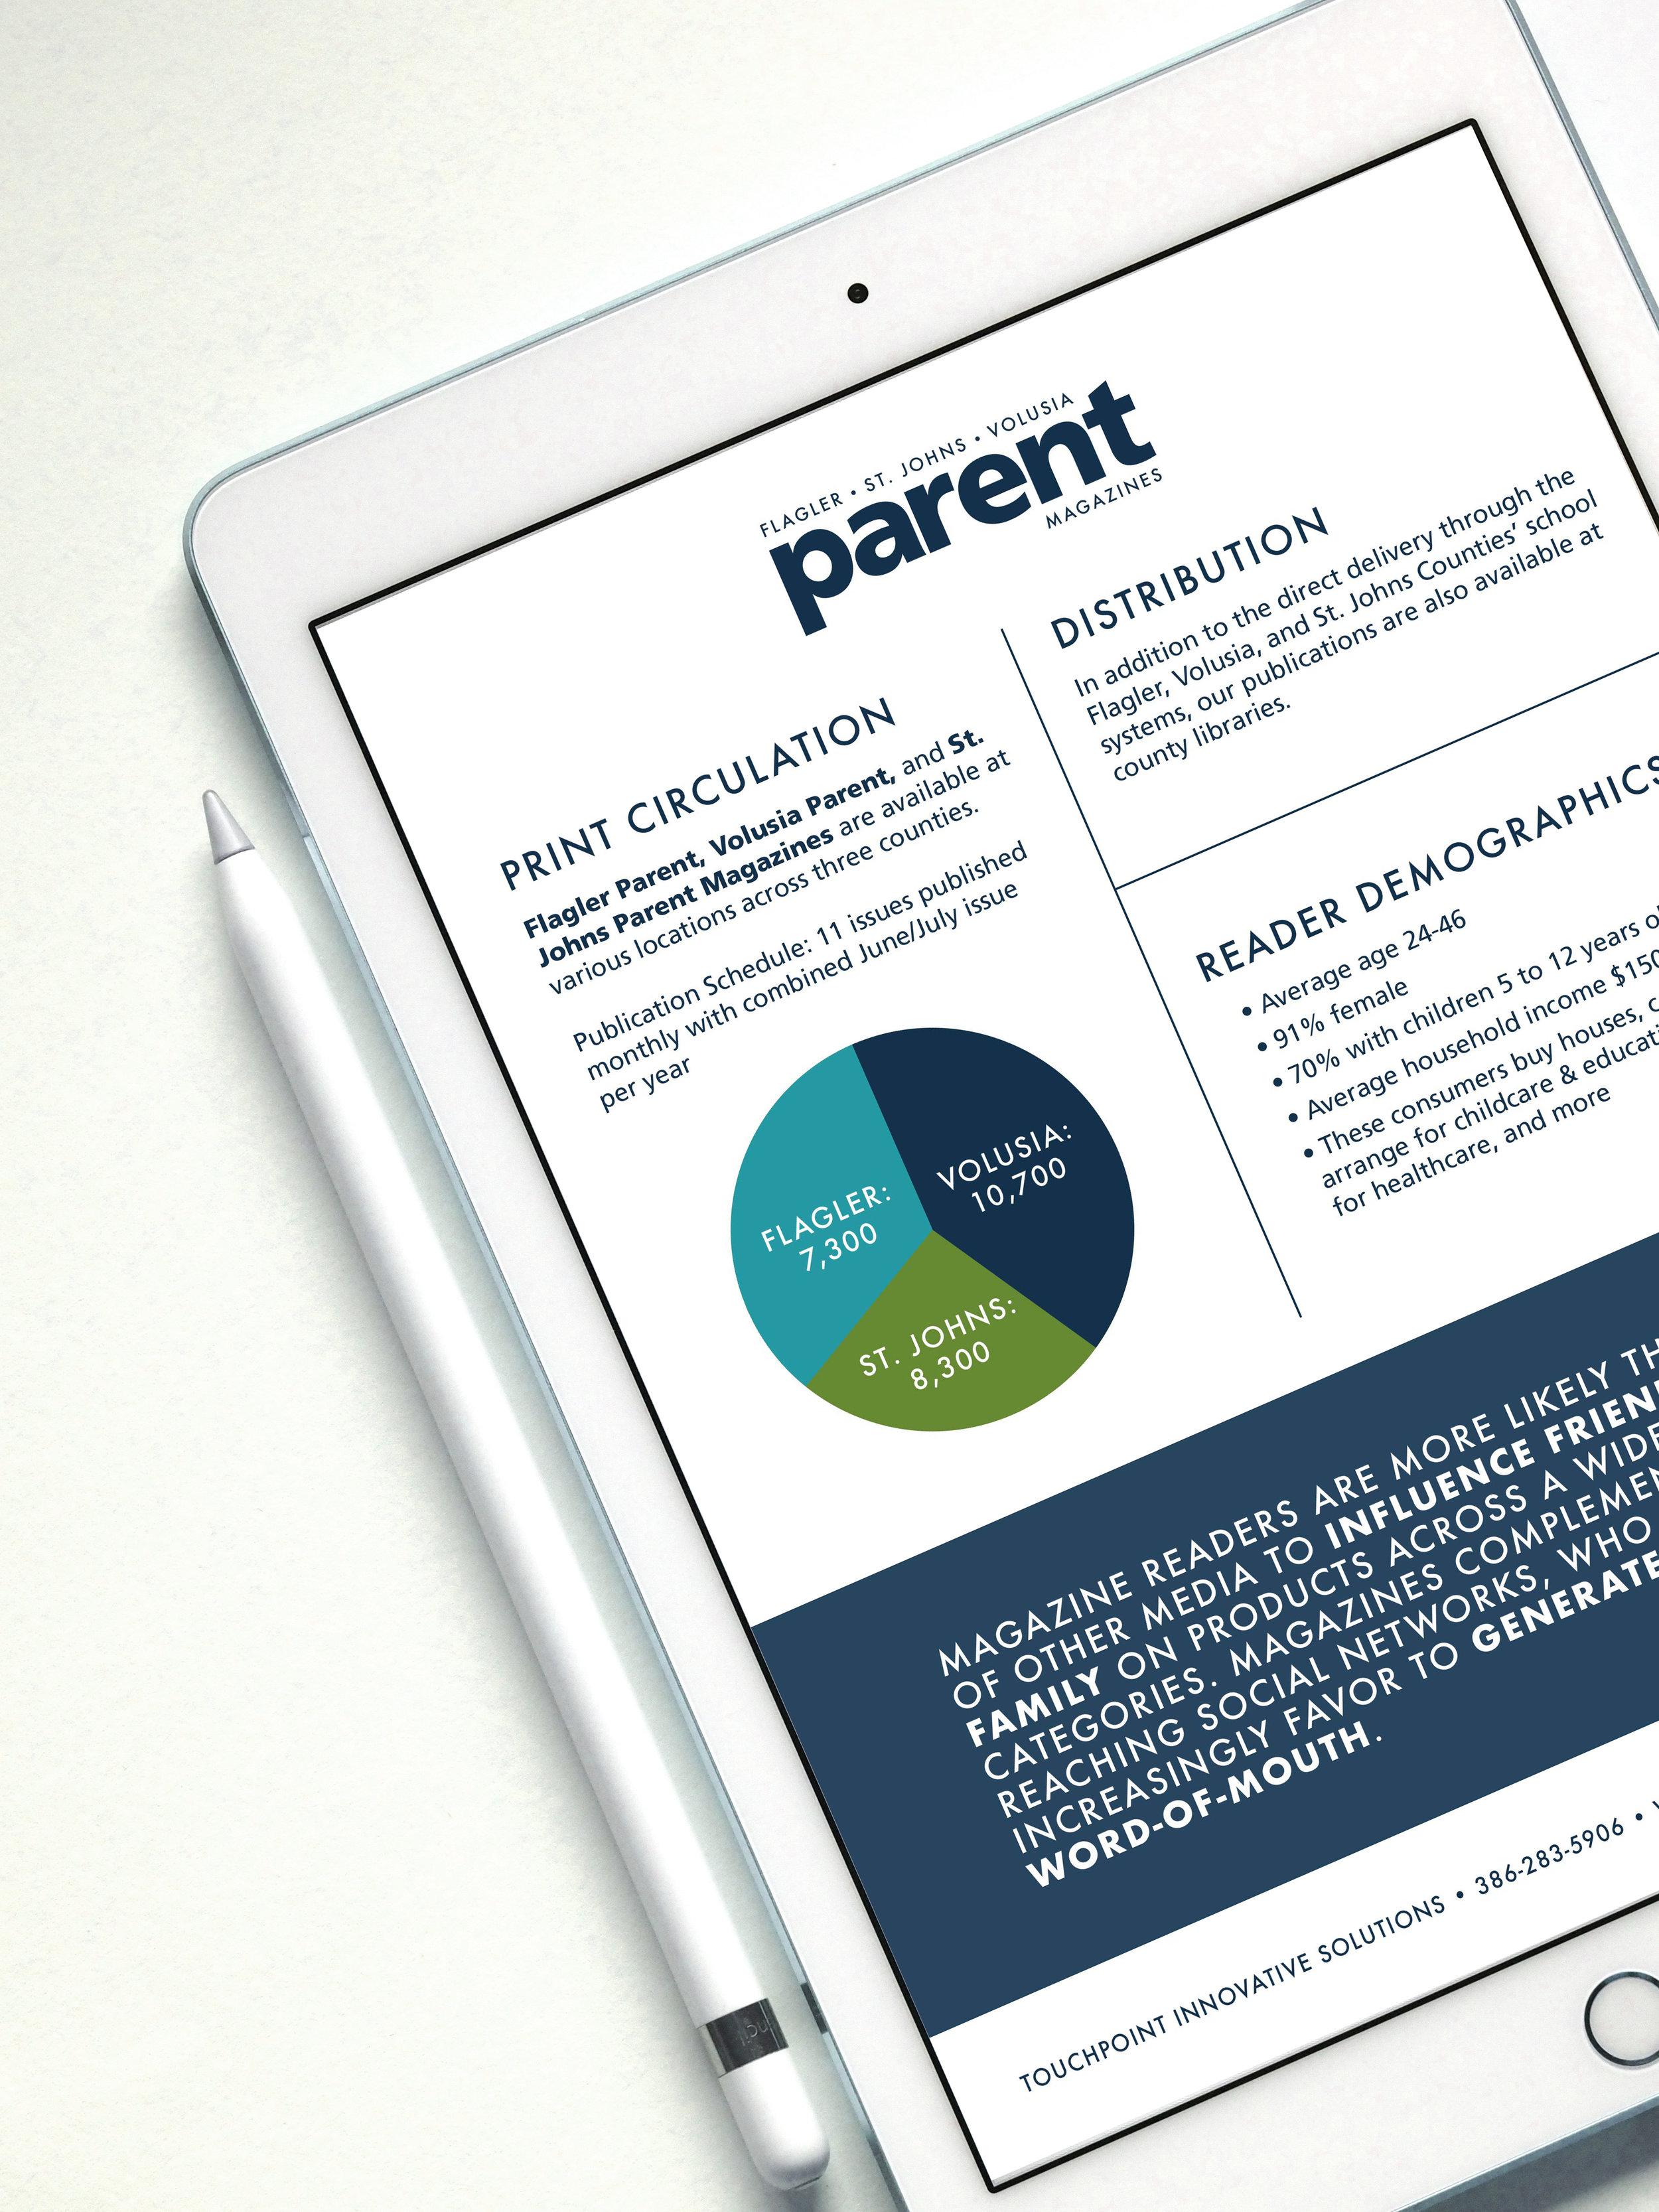 CE Studios: Branding, brand refresh, product media kit design for parents' magazine